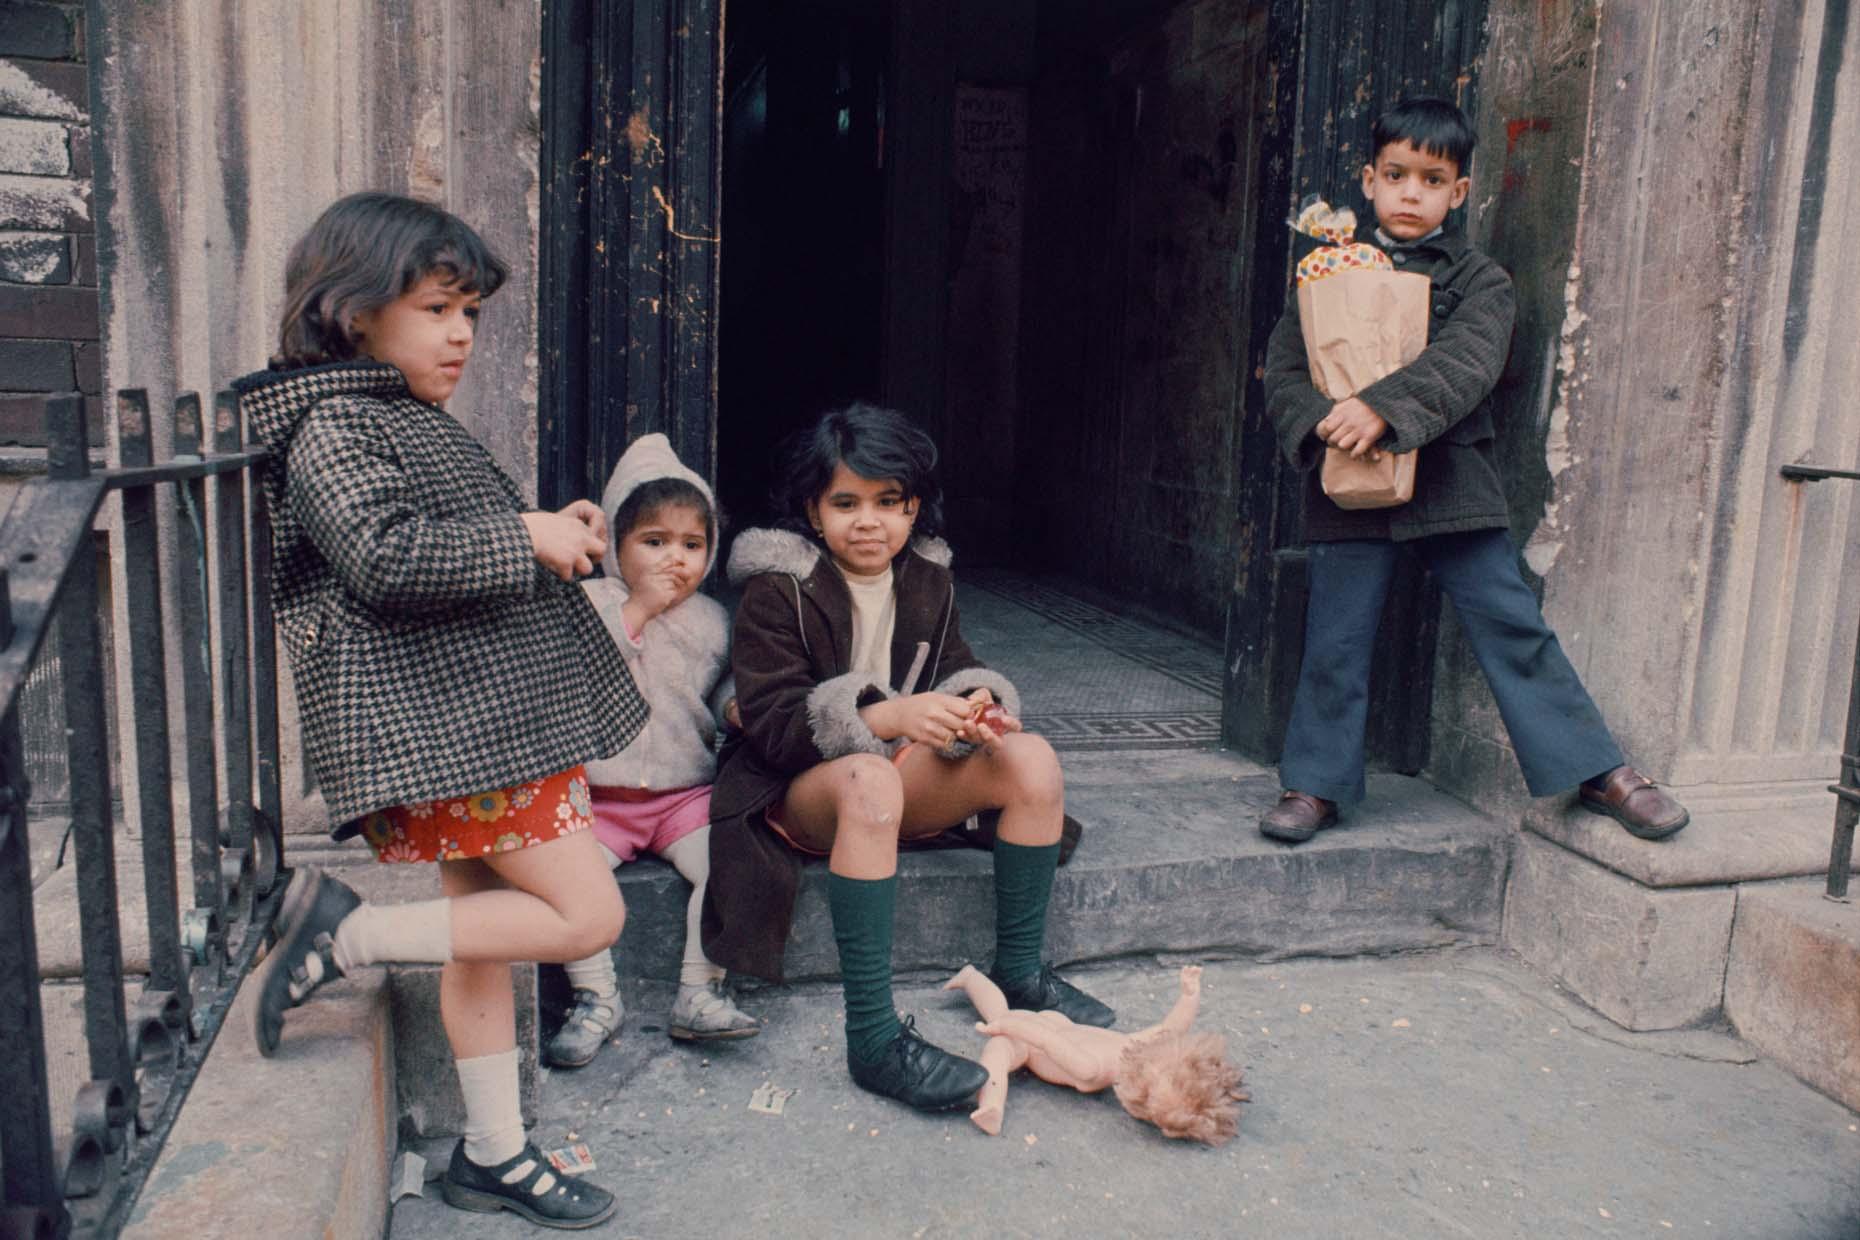 05_South Bronx, 1970_-DUP9